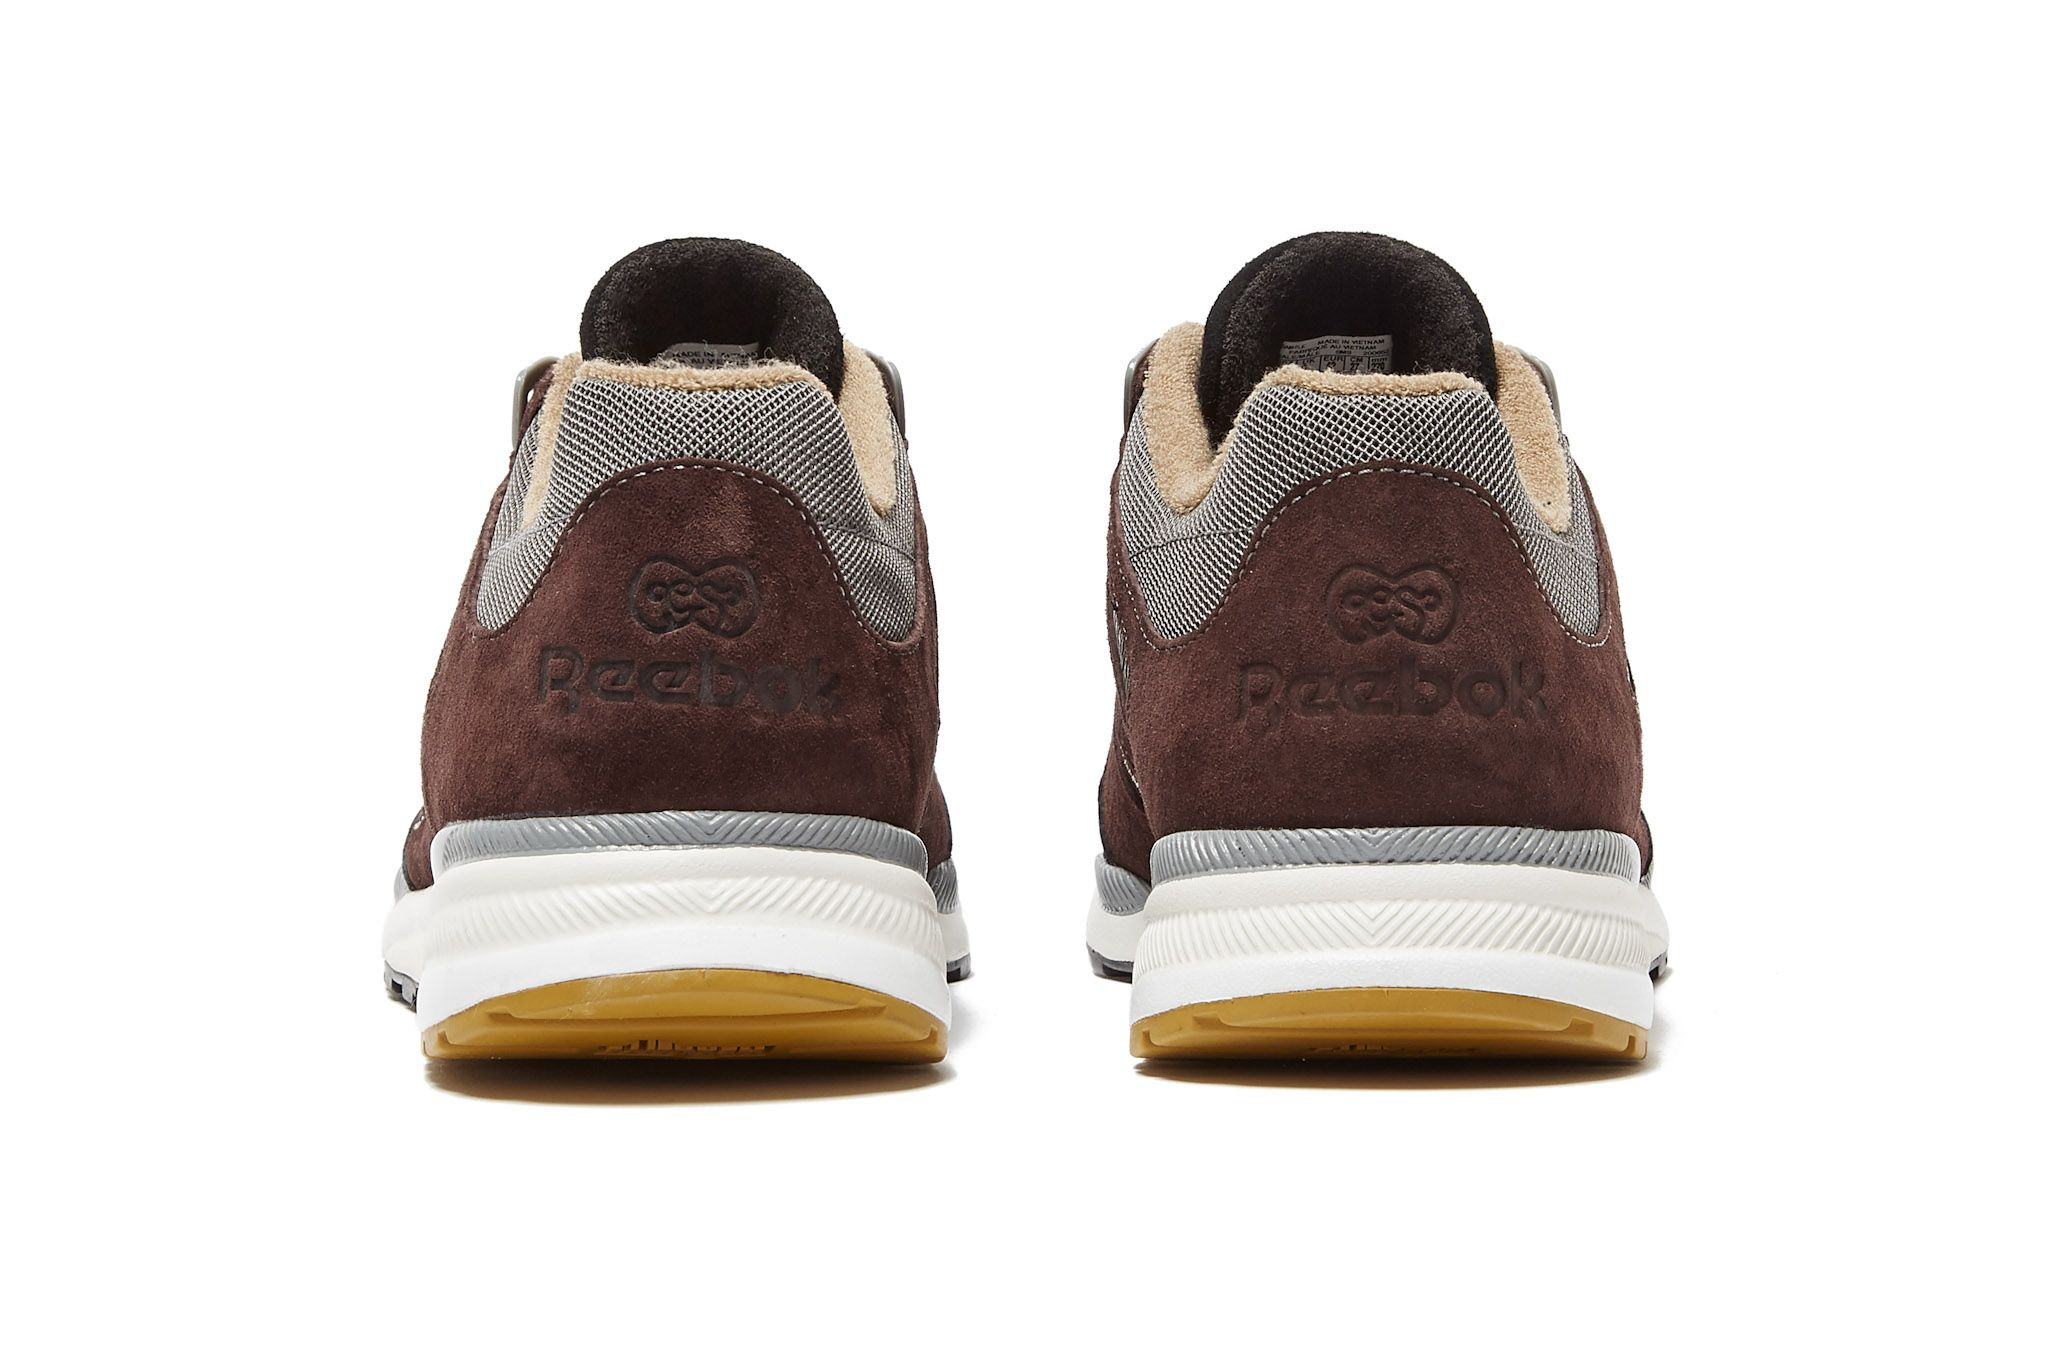 Reebok Classic x Garbstore – Part 3,  #Garbstore #Part3 #ReebokClassic #sneaker, #agpos, #sneaker, #sneakers, #sneakerhead, #solecollector, #sneakerfreaker,  #nicekicks, #kicks, #kotd, #kicks4eva #kicks0l0gy, #kicksonfire, #womft, #walklikeus, #schuhe, #turnschuhe, #yeezy, #nike, #adidas, #puma, #asics, #newbalance #jordan, #airjordan, #kicks